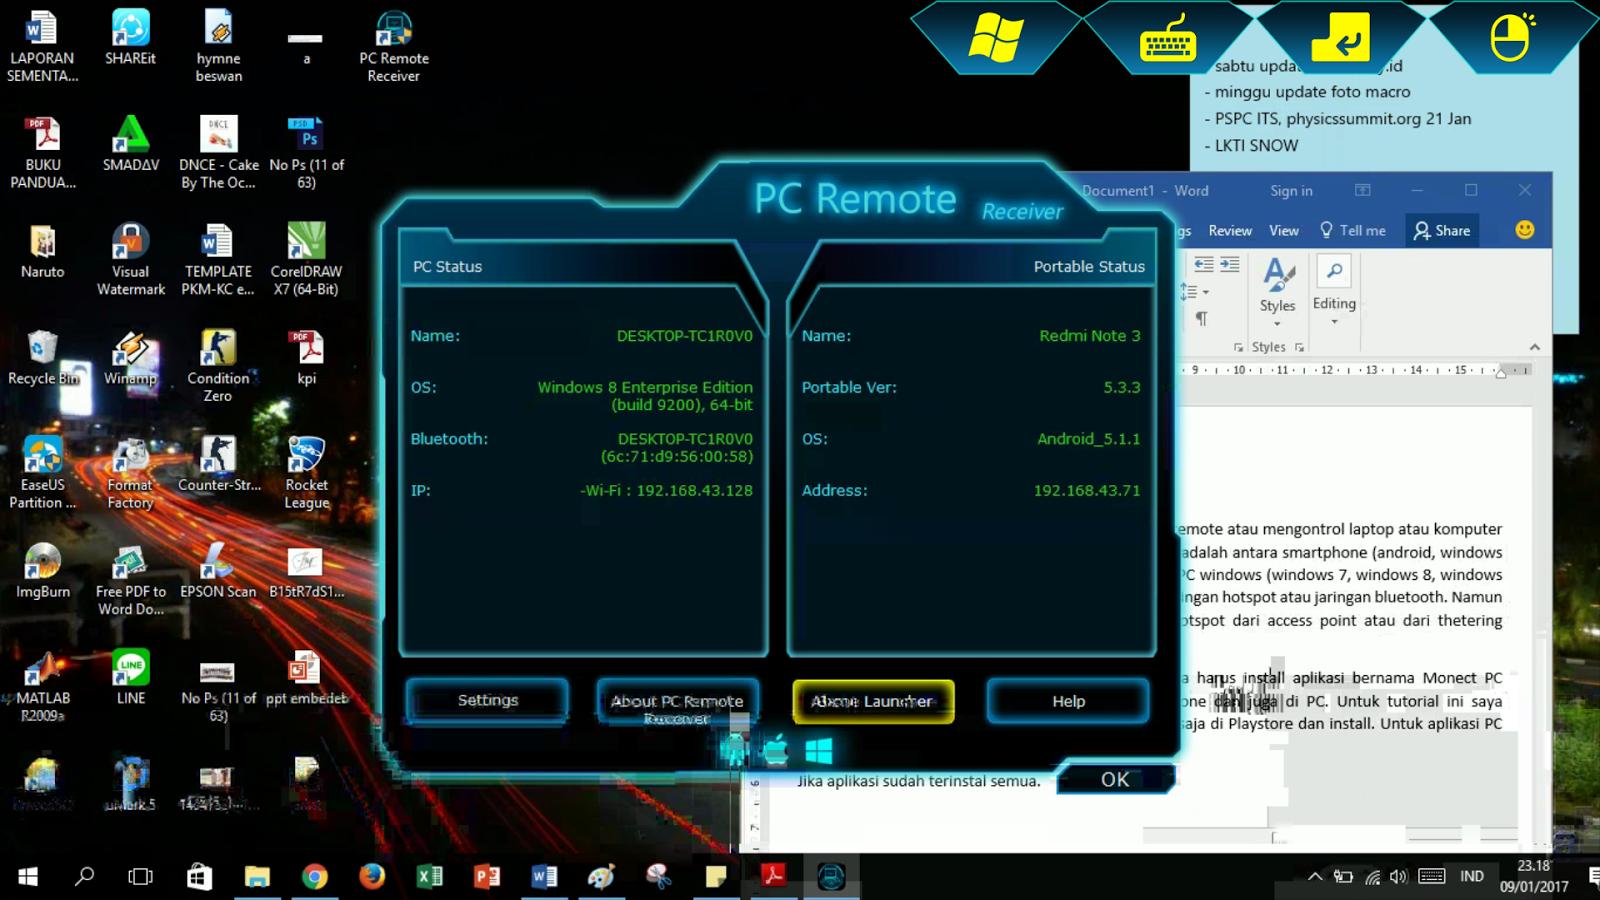 Monect PC Remote - Cara Mudah Remote PC Anda | == dinata my id ==